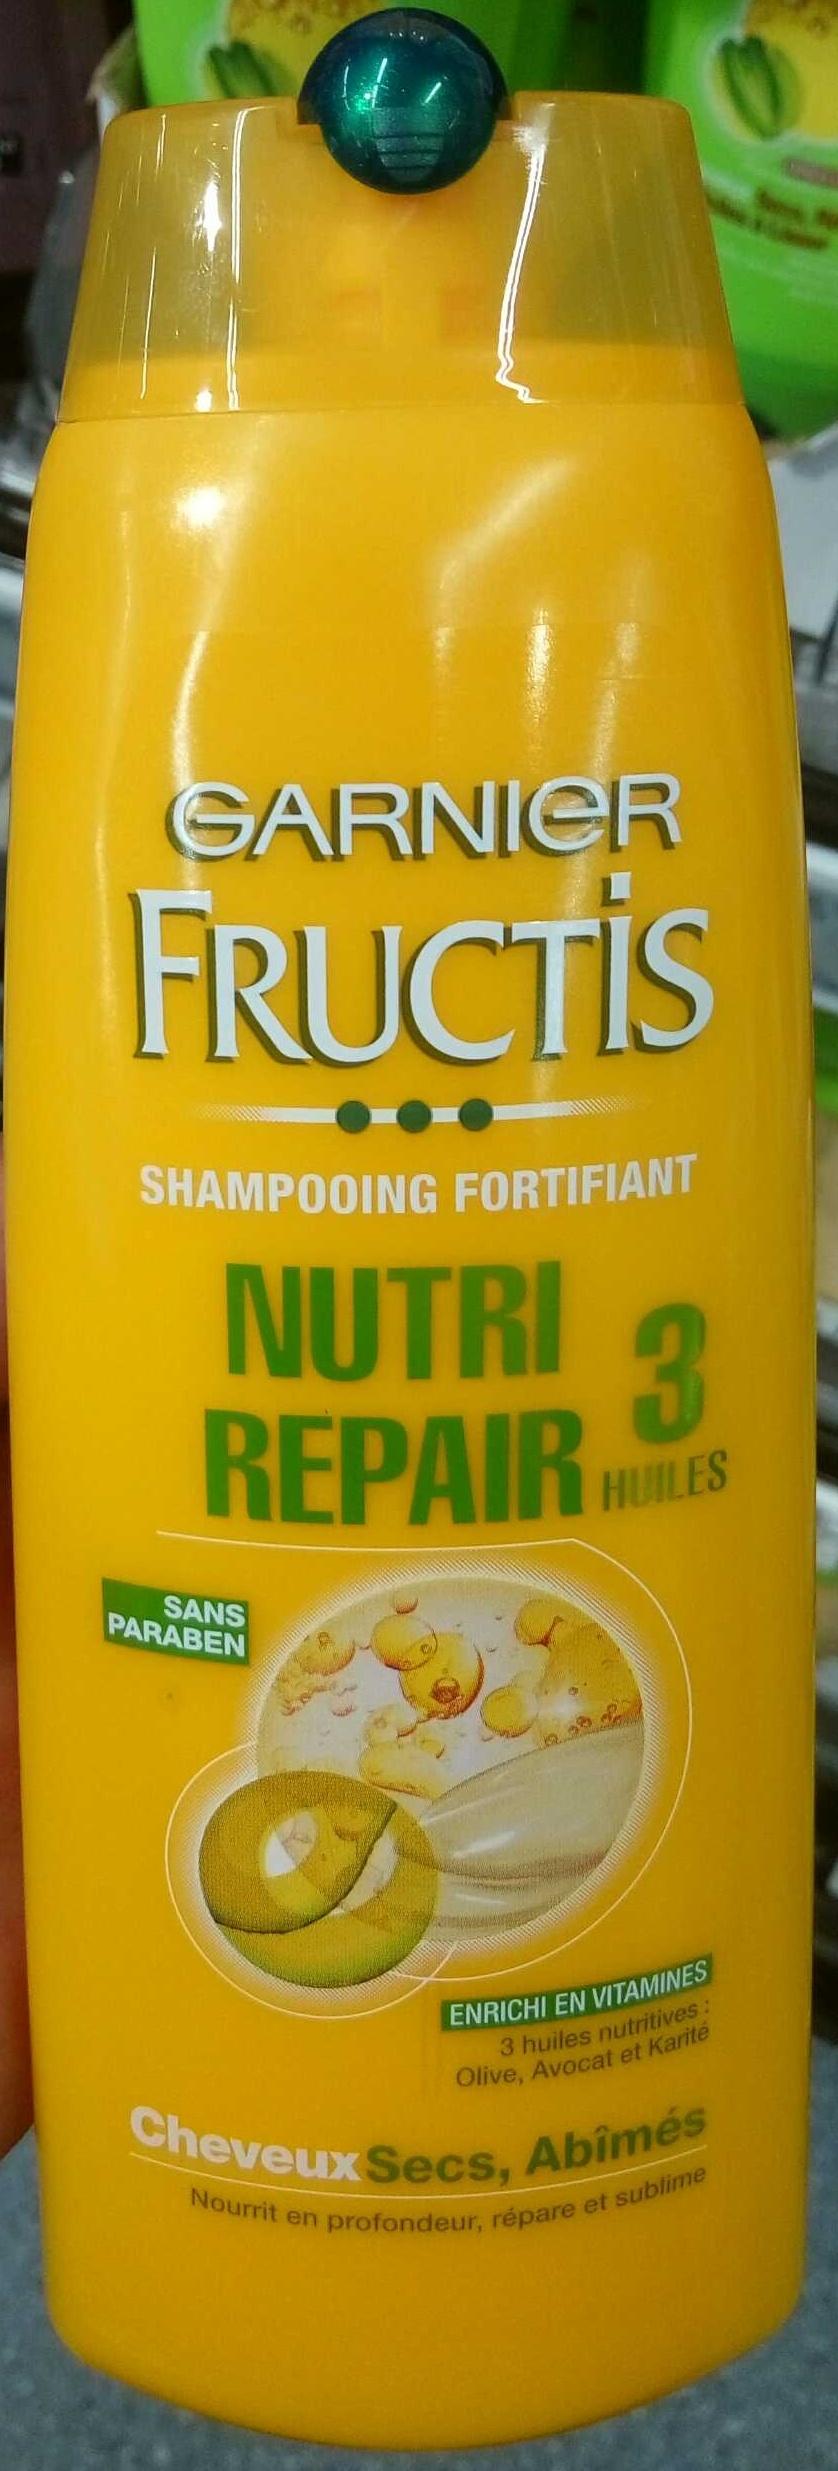 Fructis Nutri Repair 3 Huiles - Produit - fr